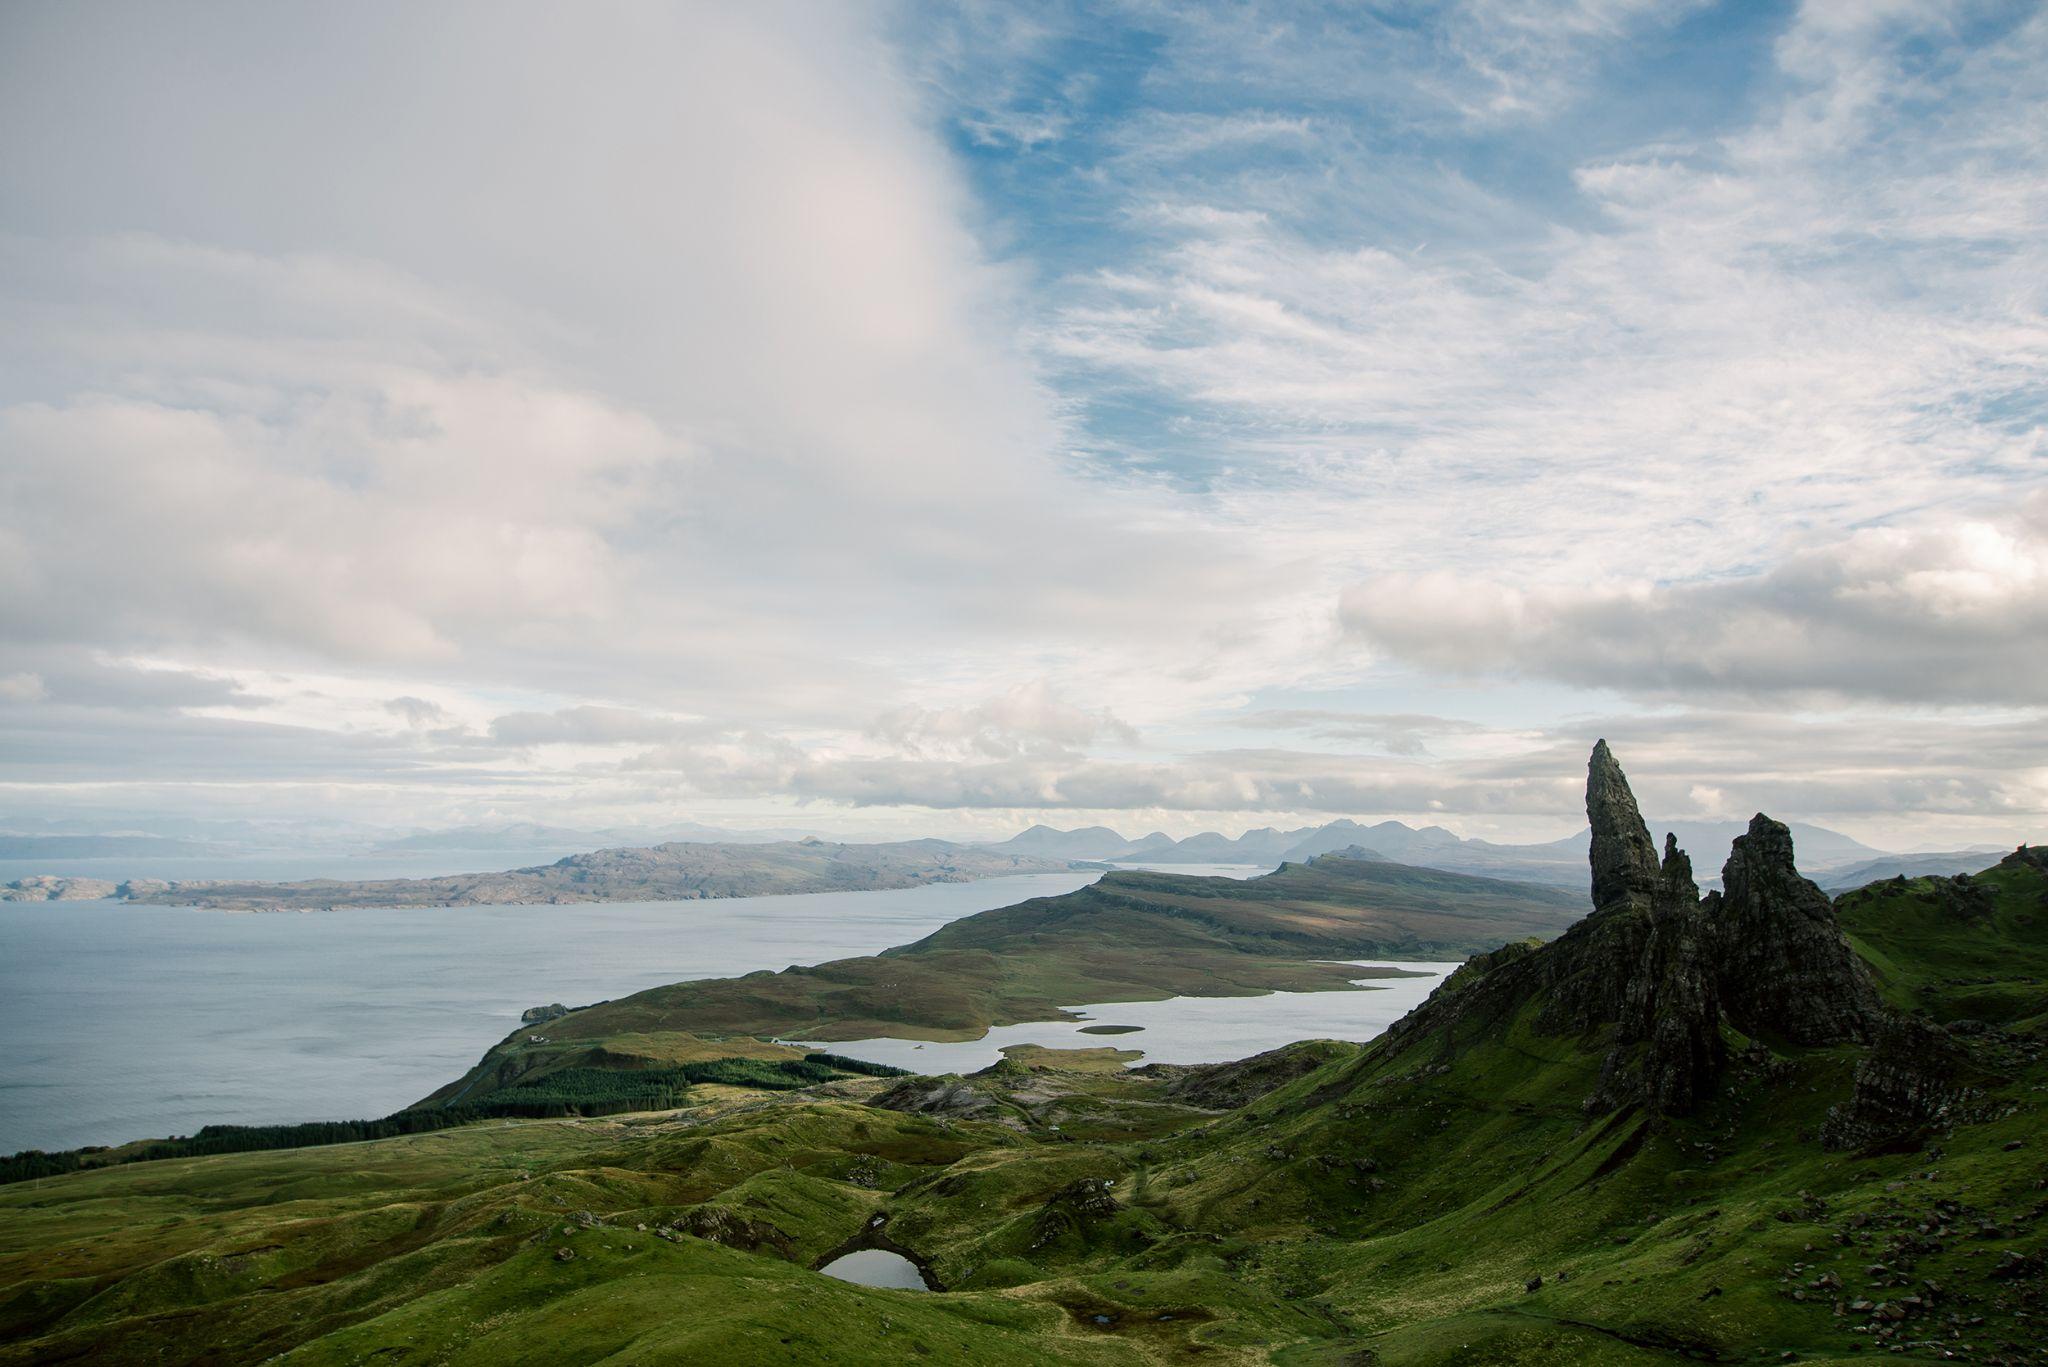 The Old Man of Storr, Isle of Skye by gorynski